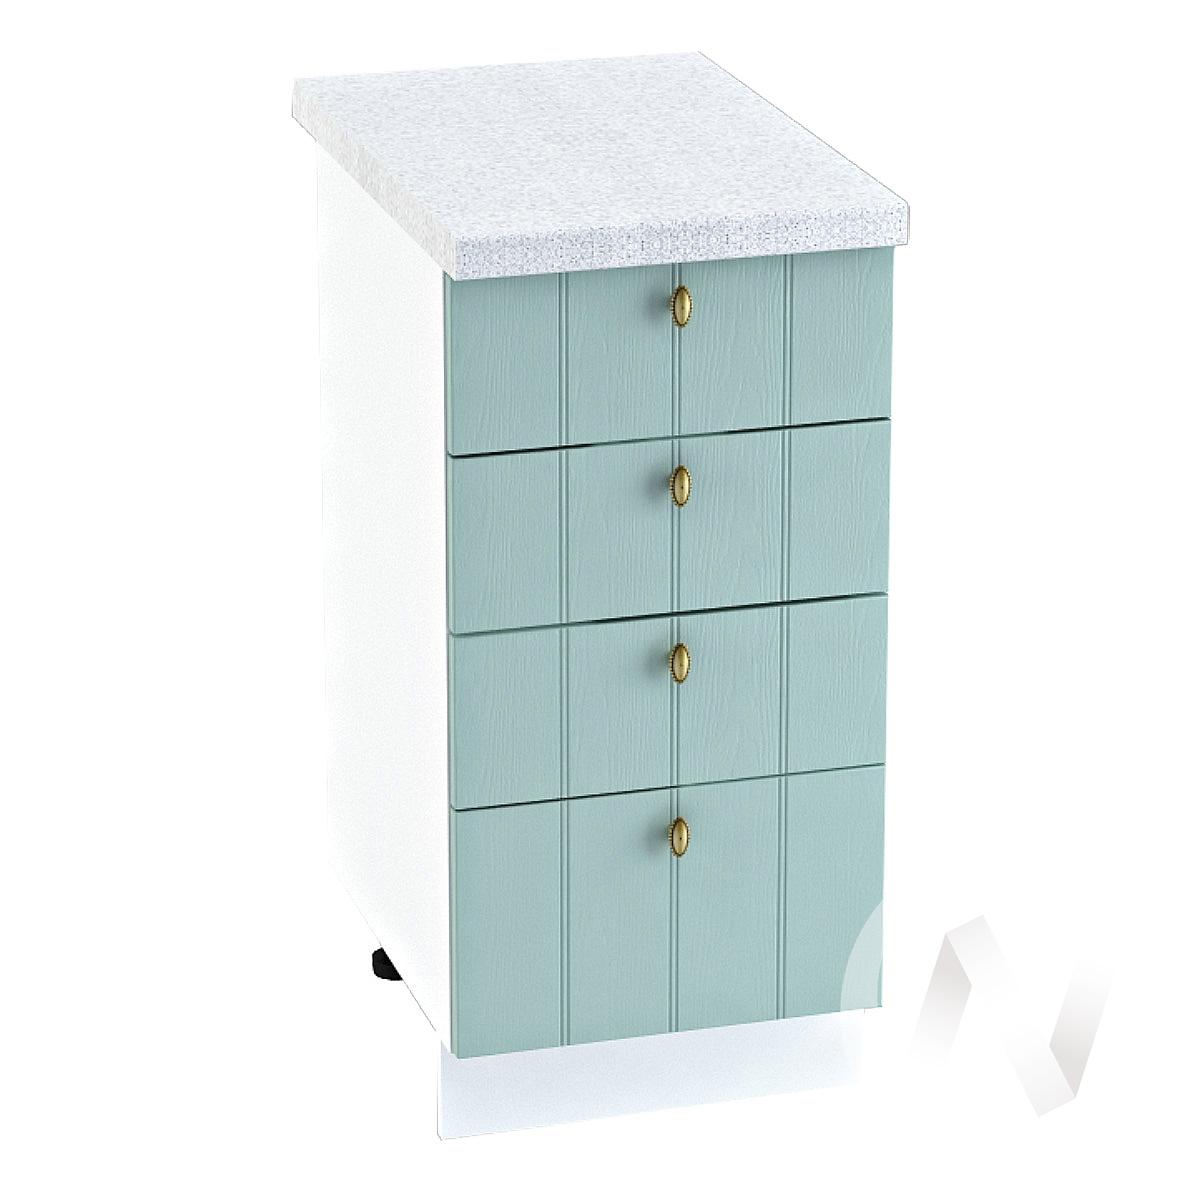 "Кухня ""Прованс"": Шкаф нижний с 4-мя ящиками 400, ШН4Я 400 (голубой/корпус белый)"